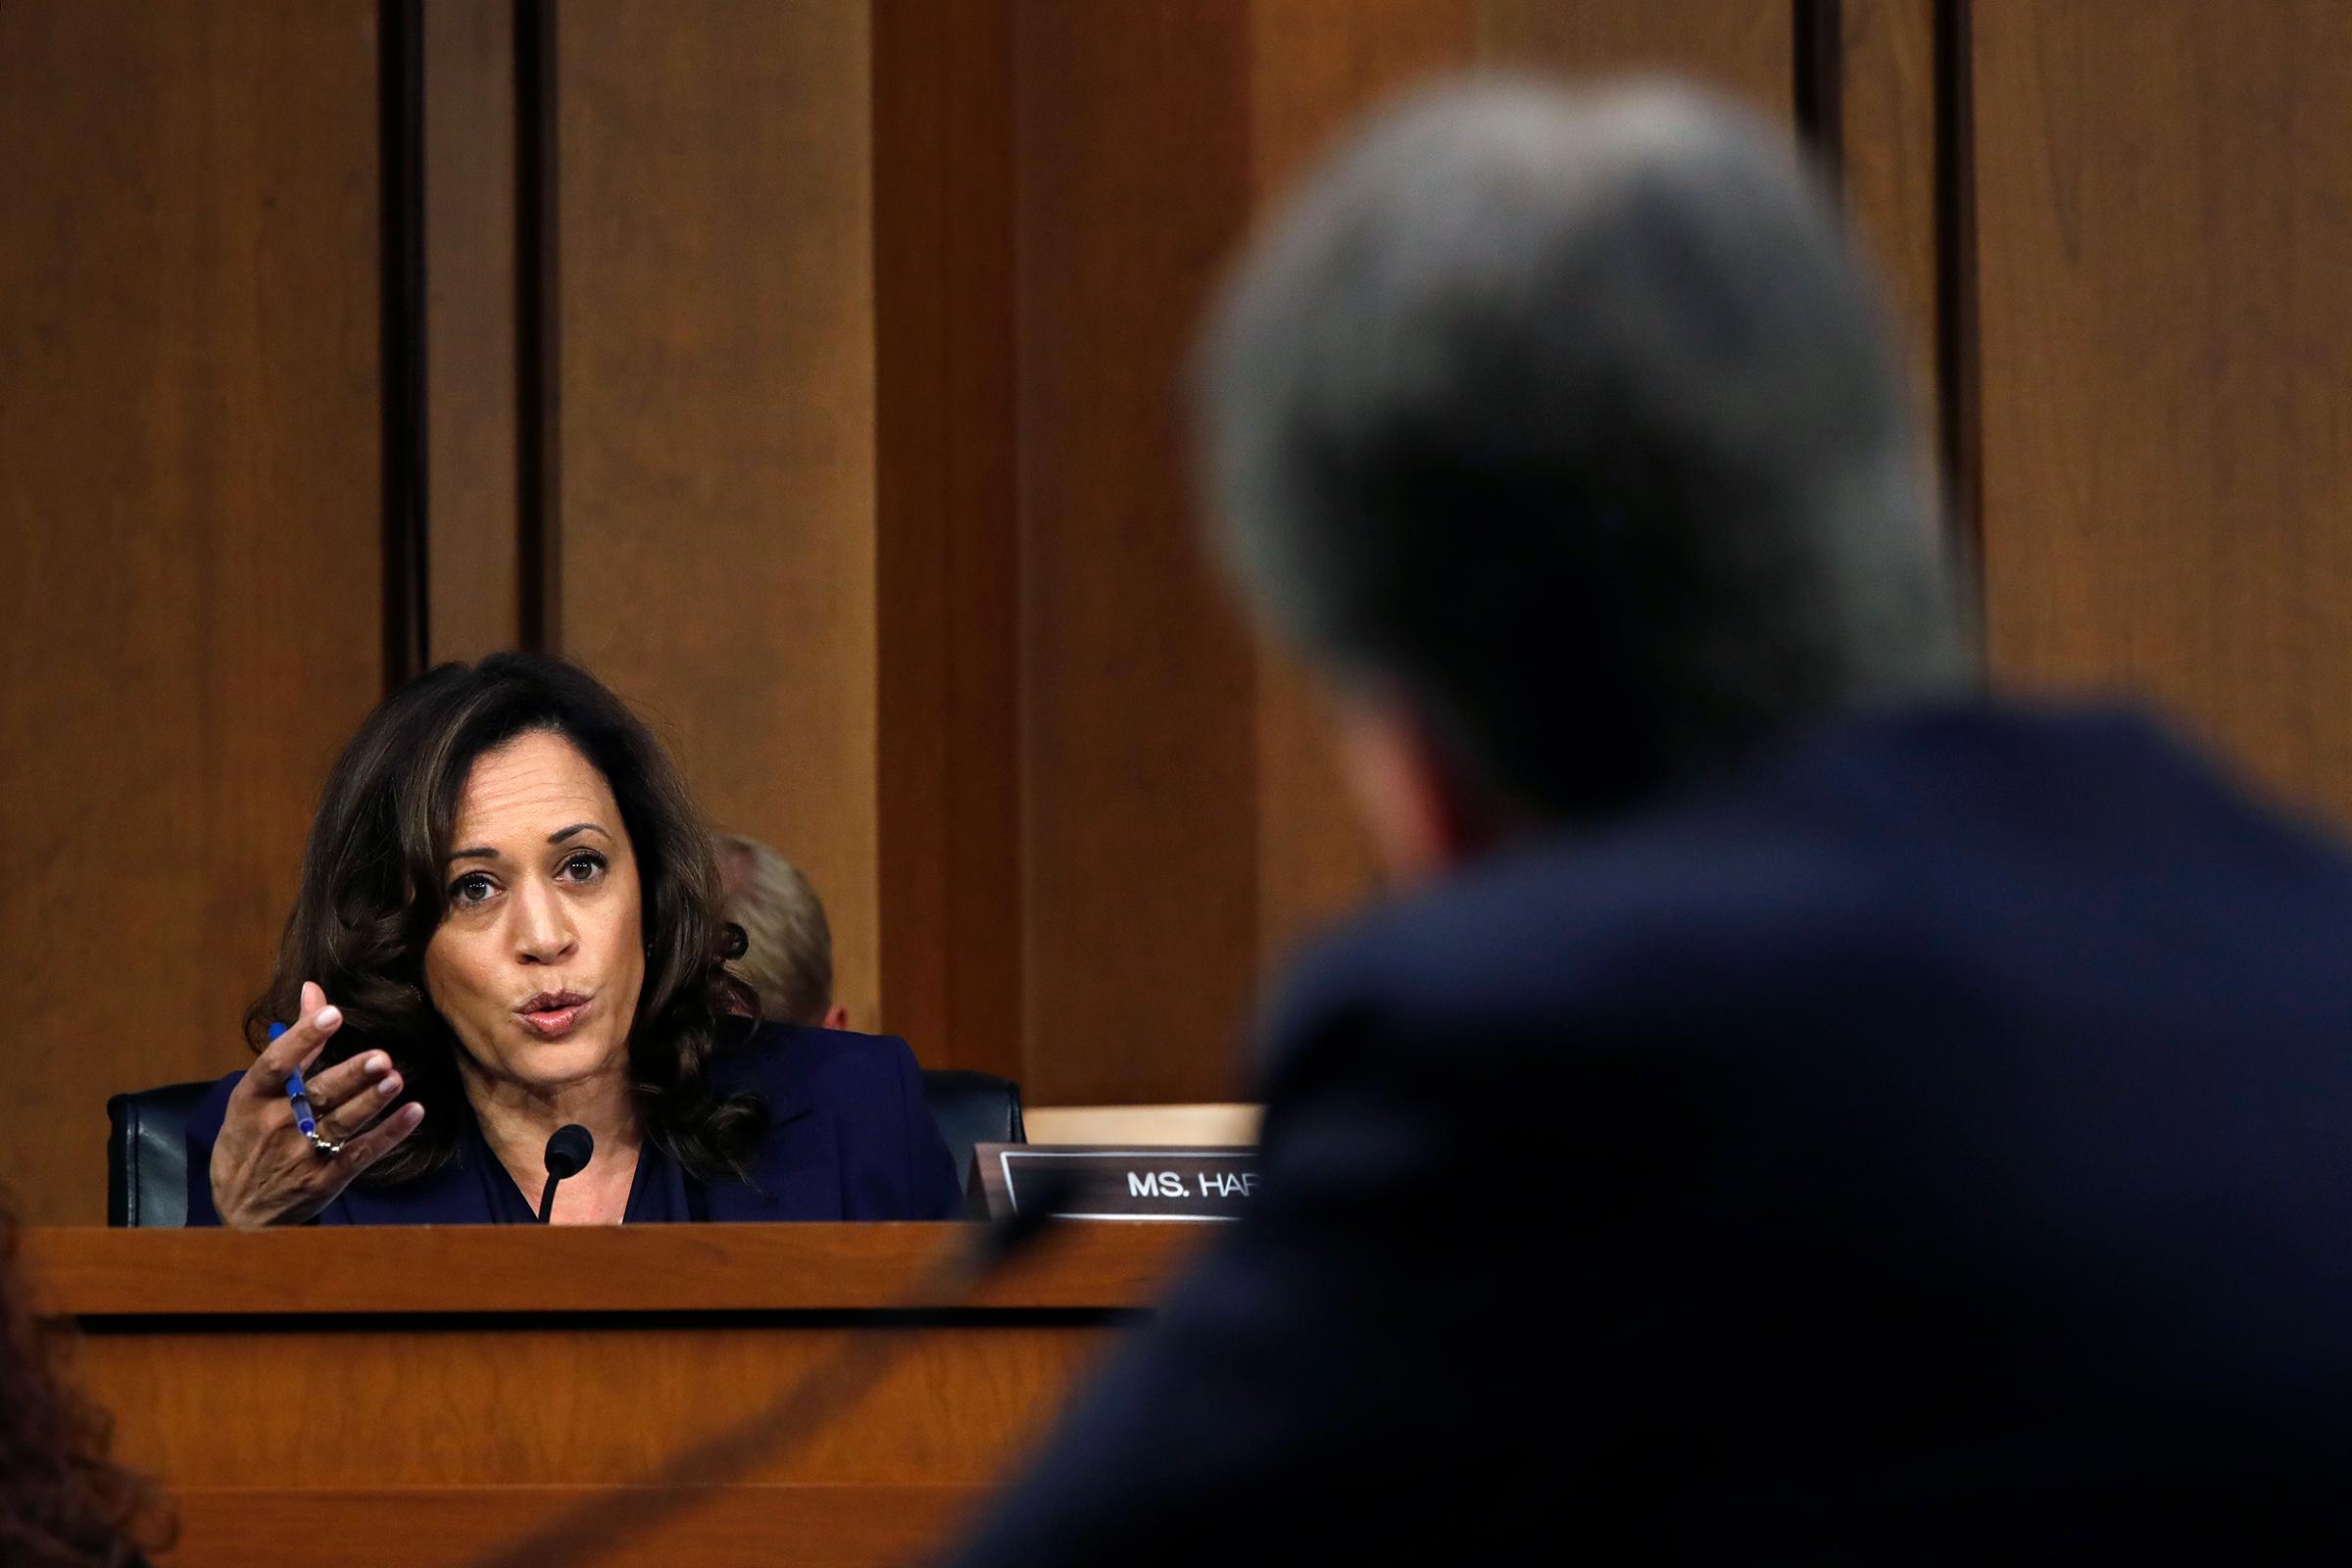 Harris rose in Senate hearings, grilling Supreme Court nominee Brett Kavanaugh in September 2018